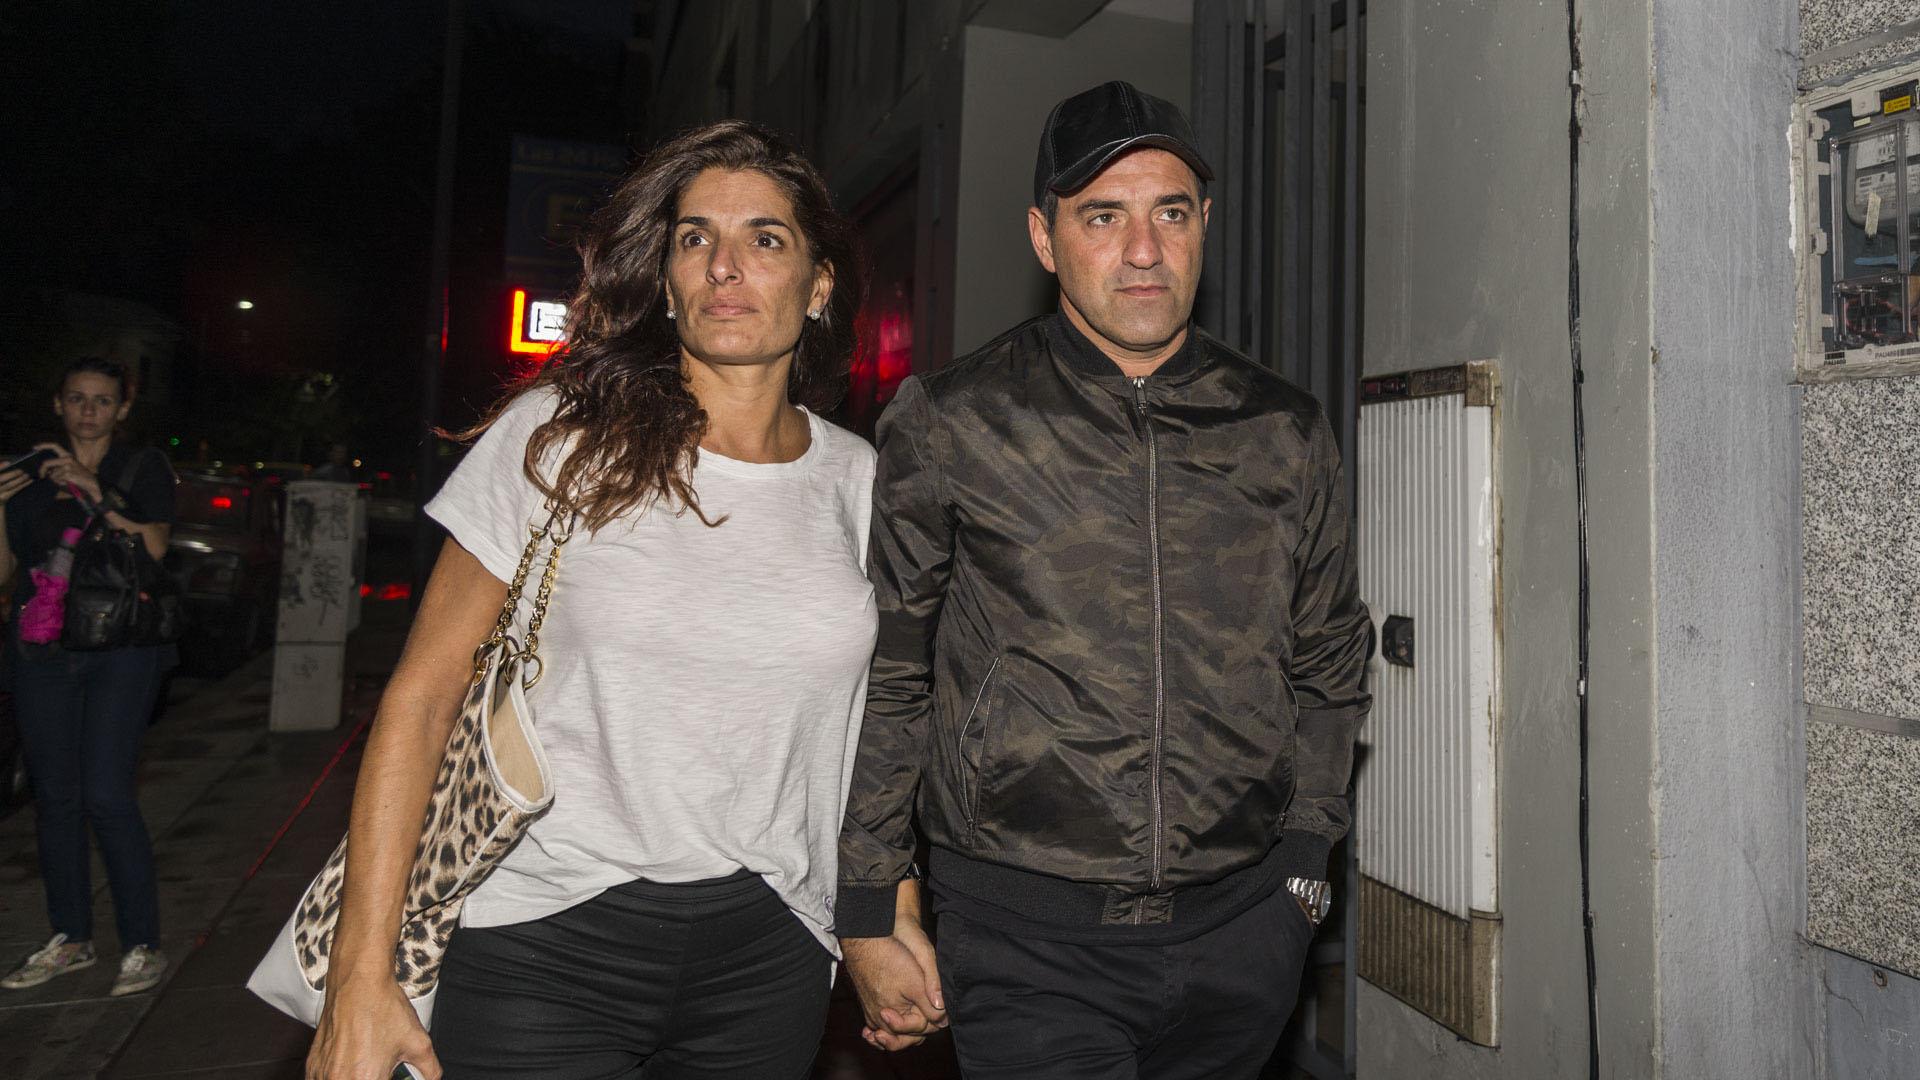 Mariano Iúdica y su mujer Romina Propato